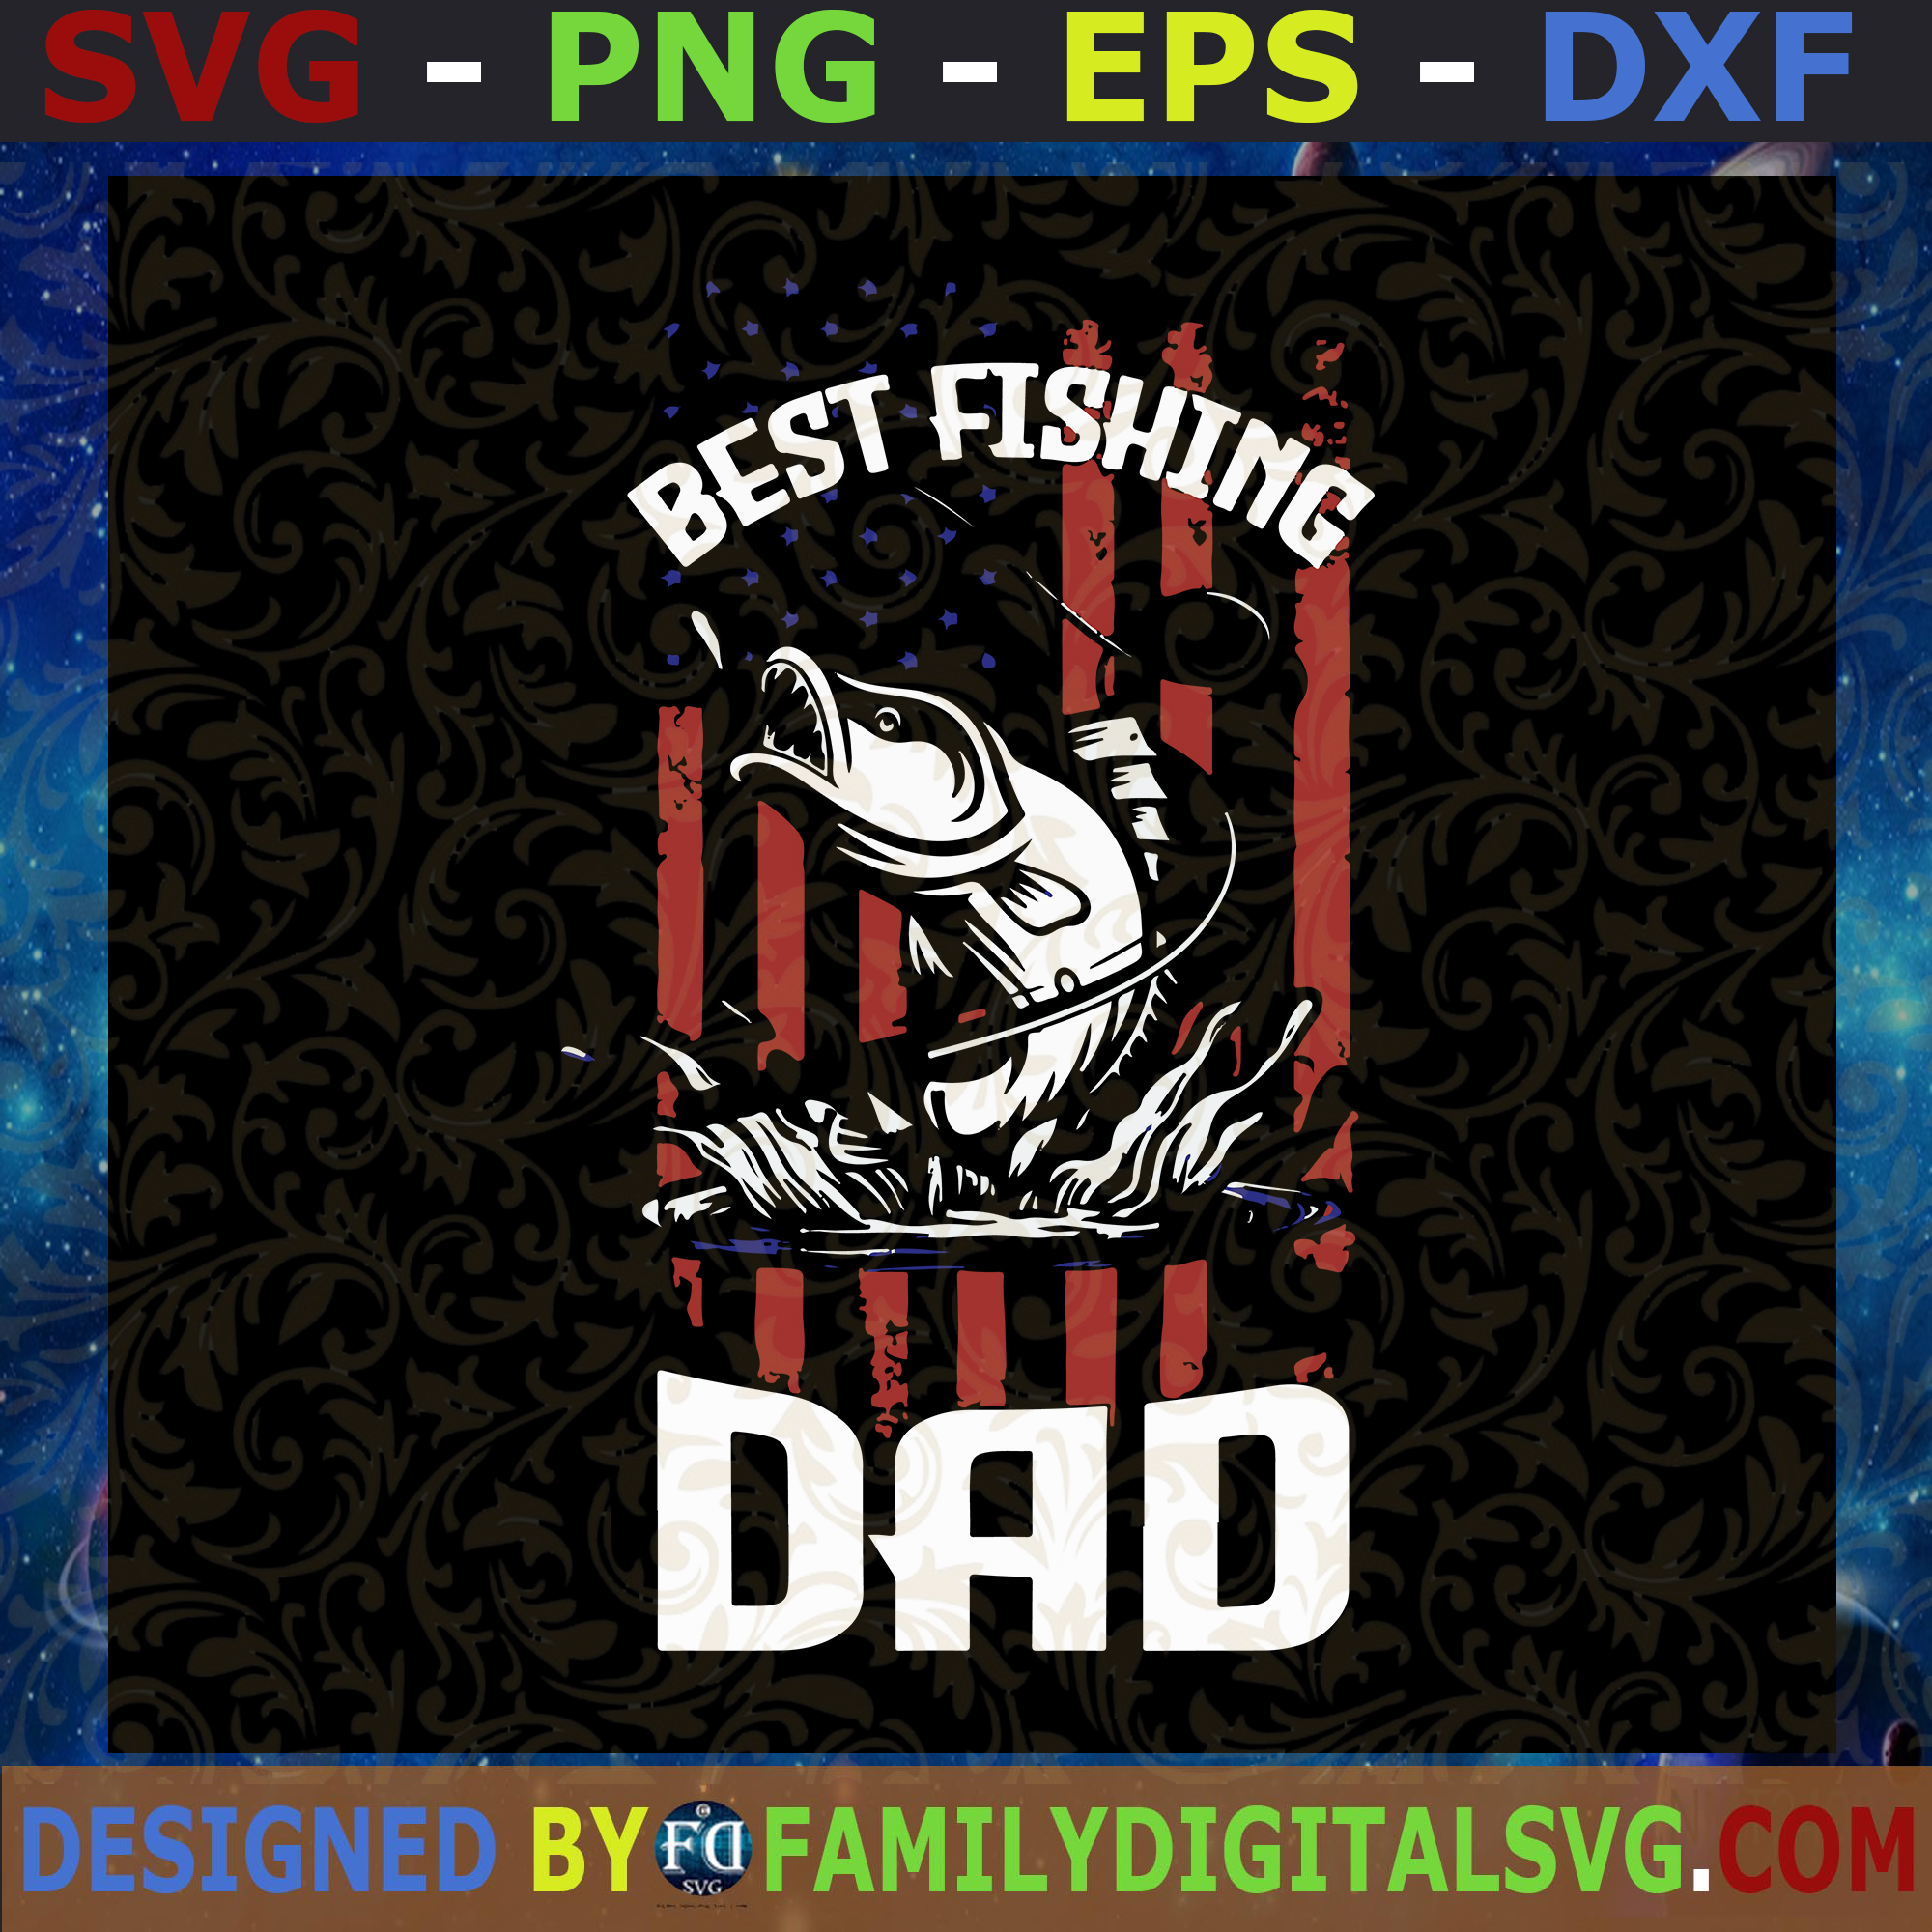 Download Best Fishing Dad Svg Best Fishing Svg Dad Fishing Svg Fishing American Svg Happy Birthday Dad Svg Digital Files Cut Files For Cricut Instant Download Vector Download Print Files Familydigitalsvg Com